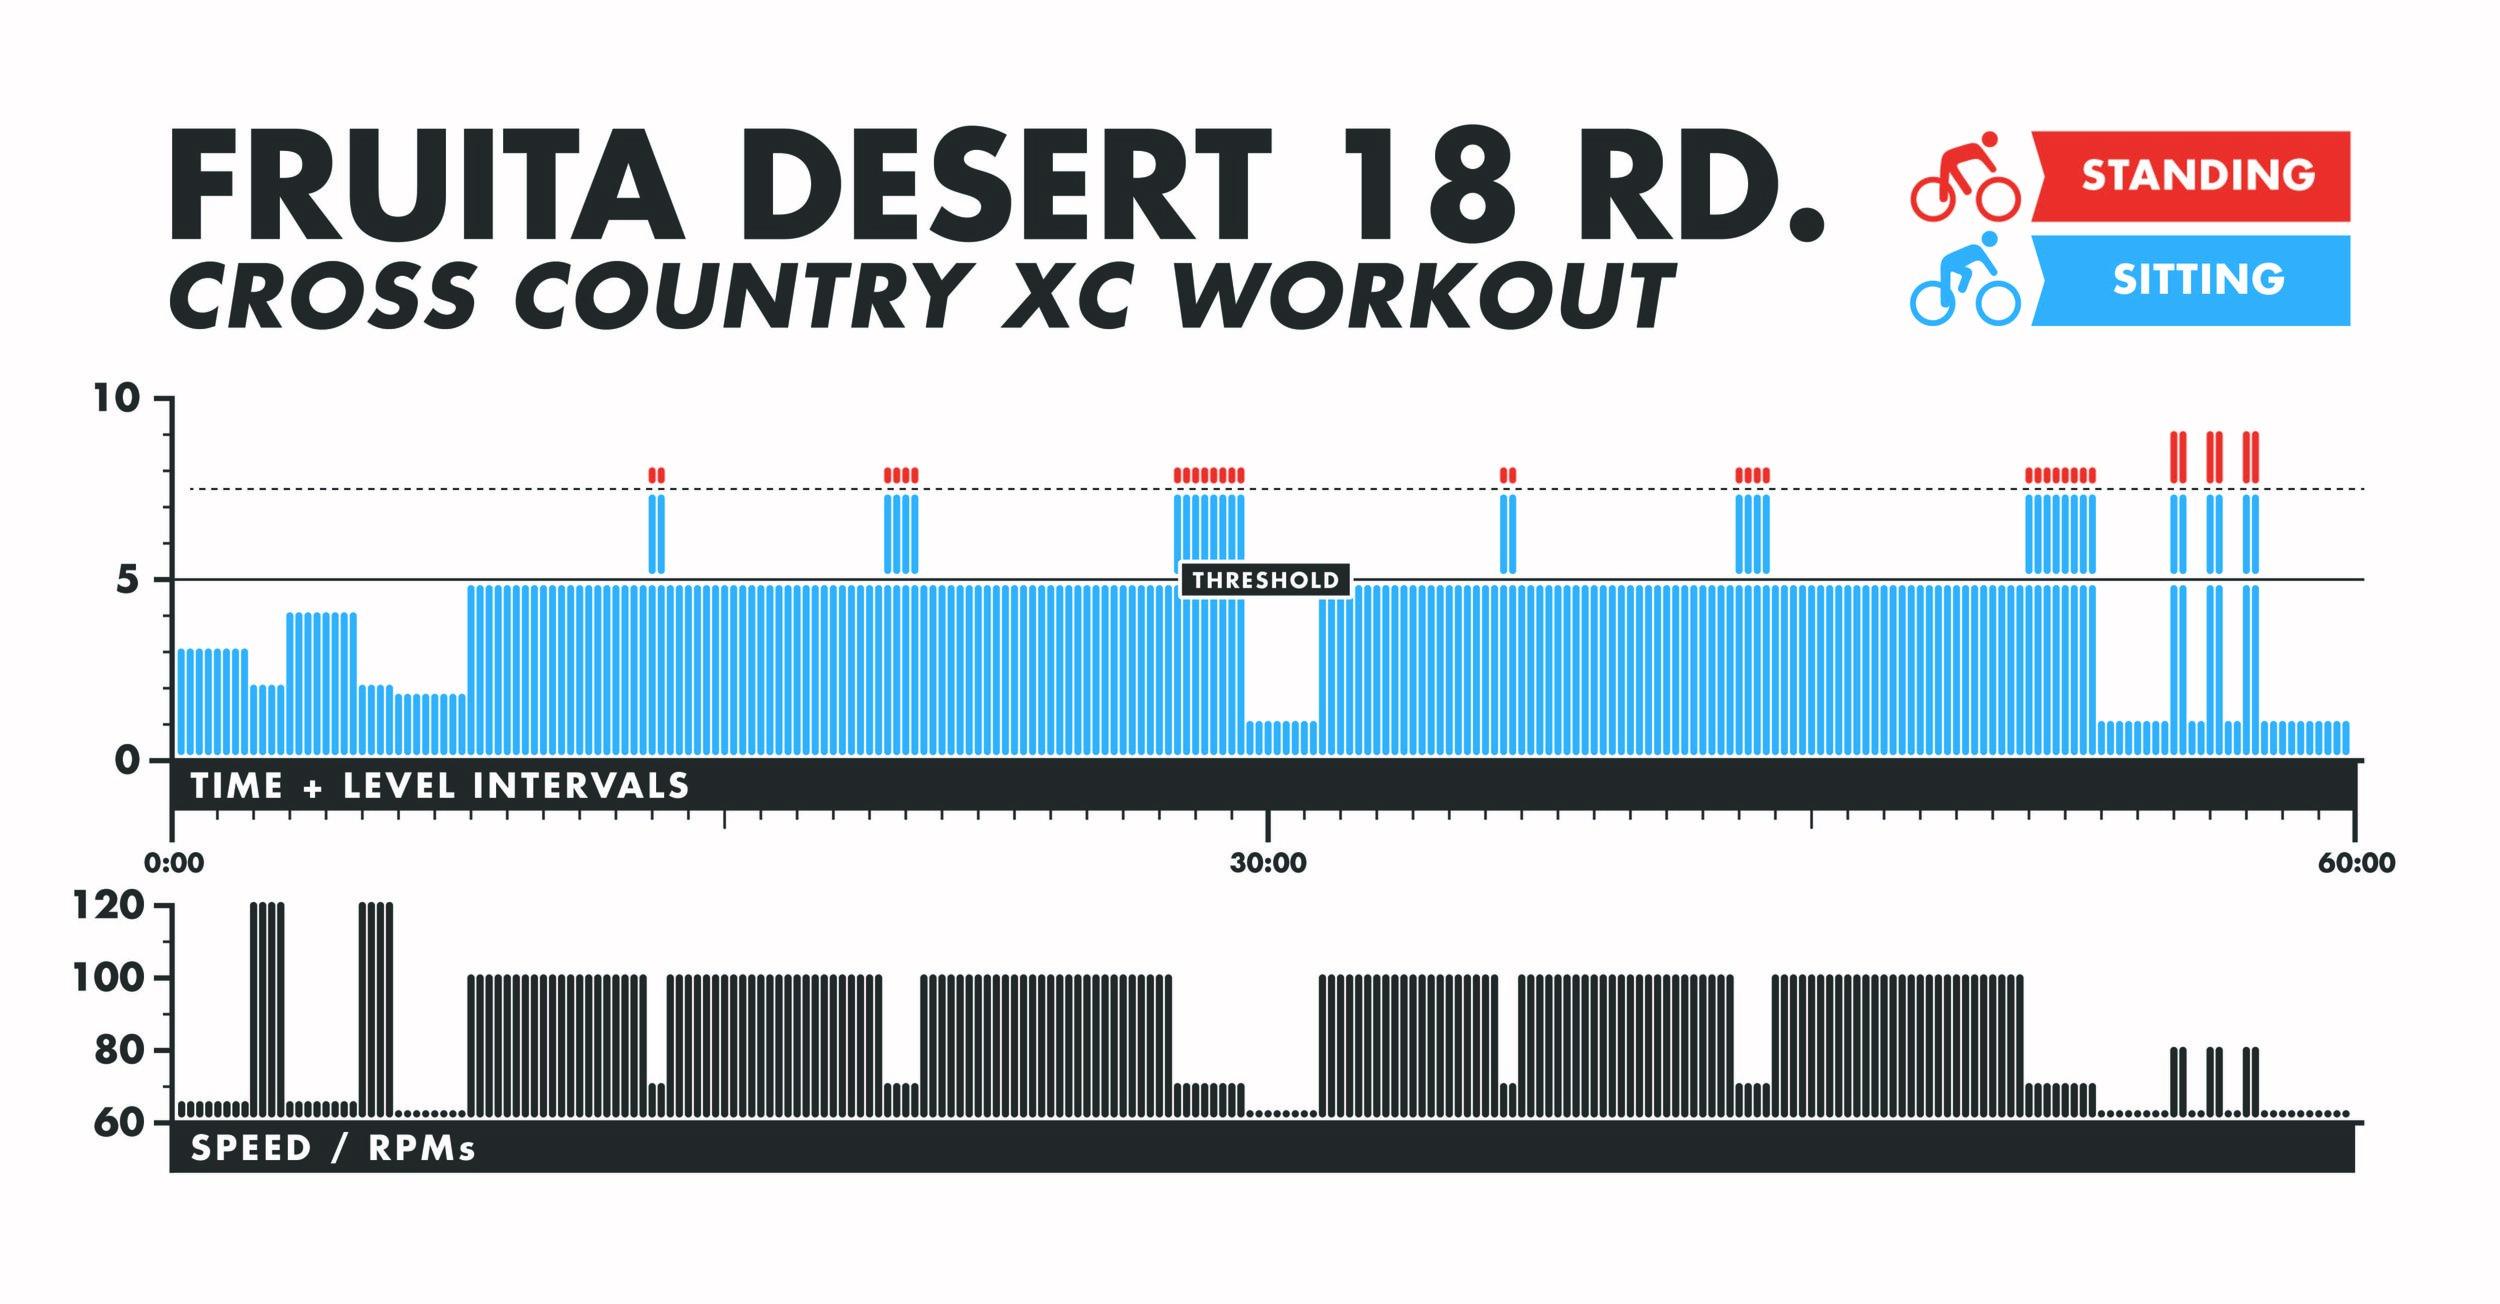 18Rd-XC Info-Graphic.jpg